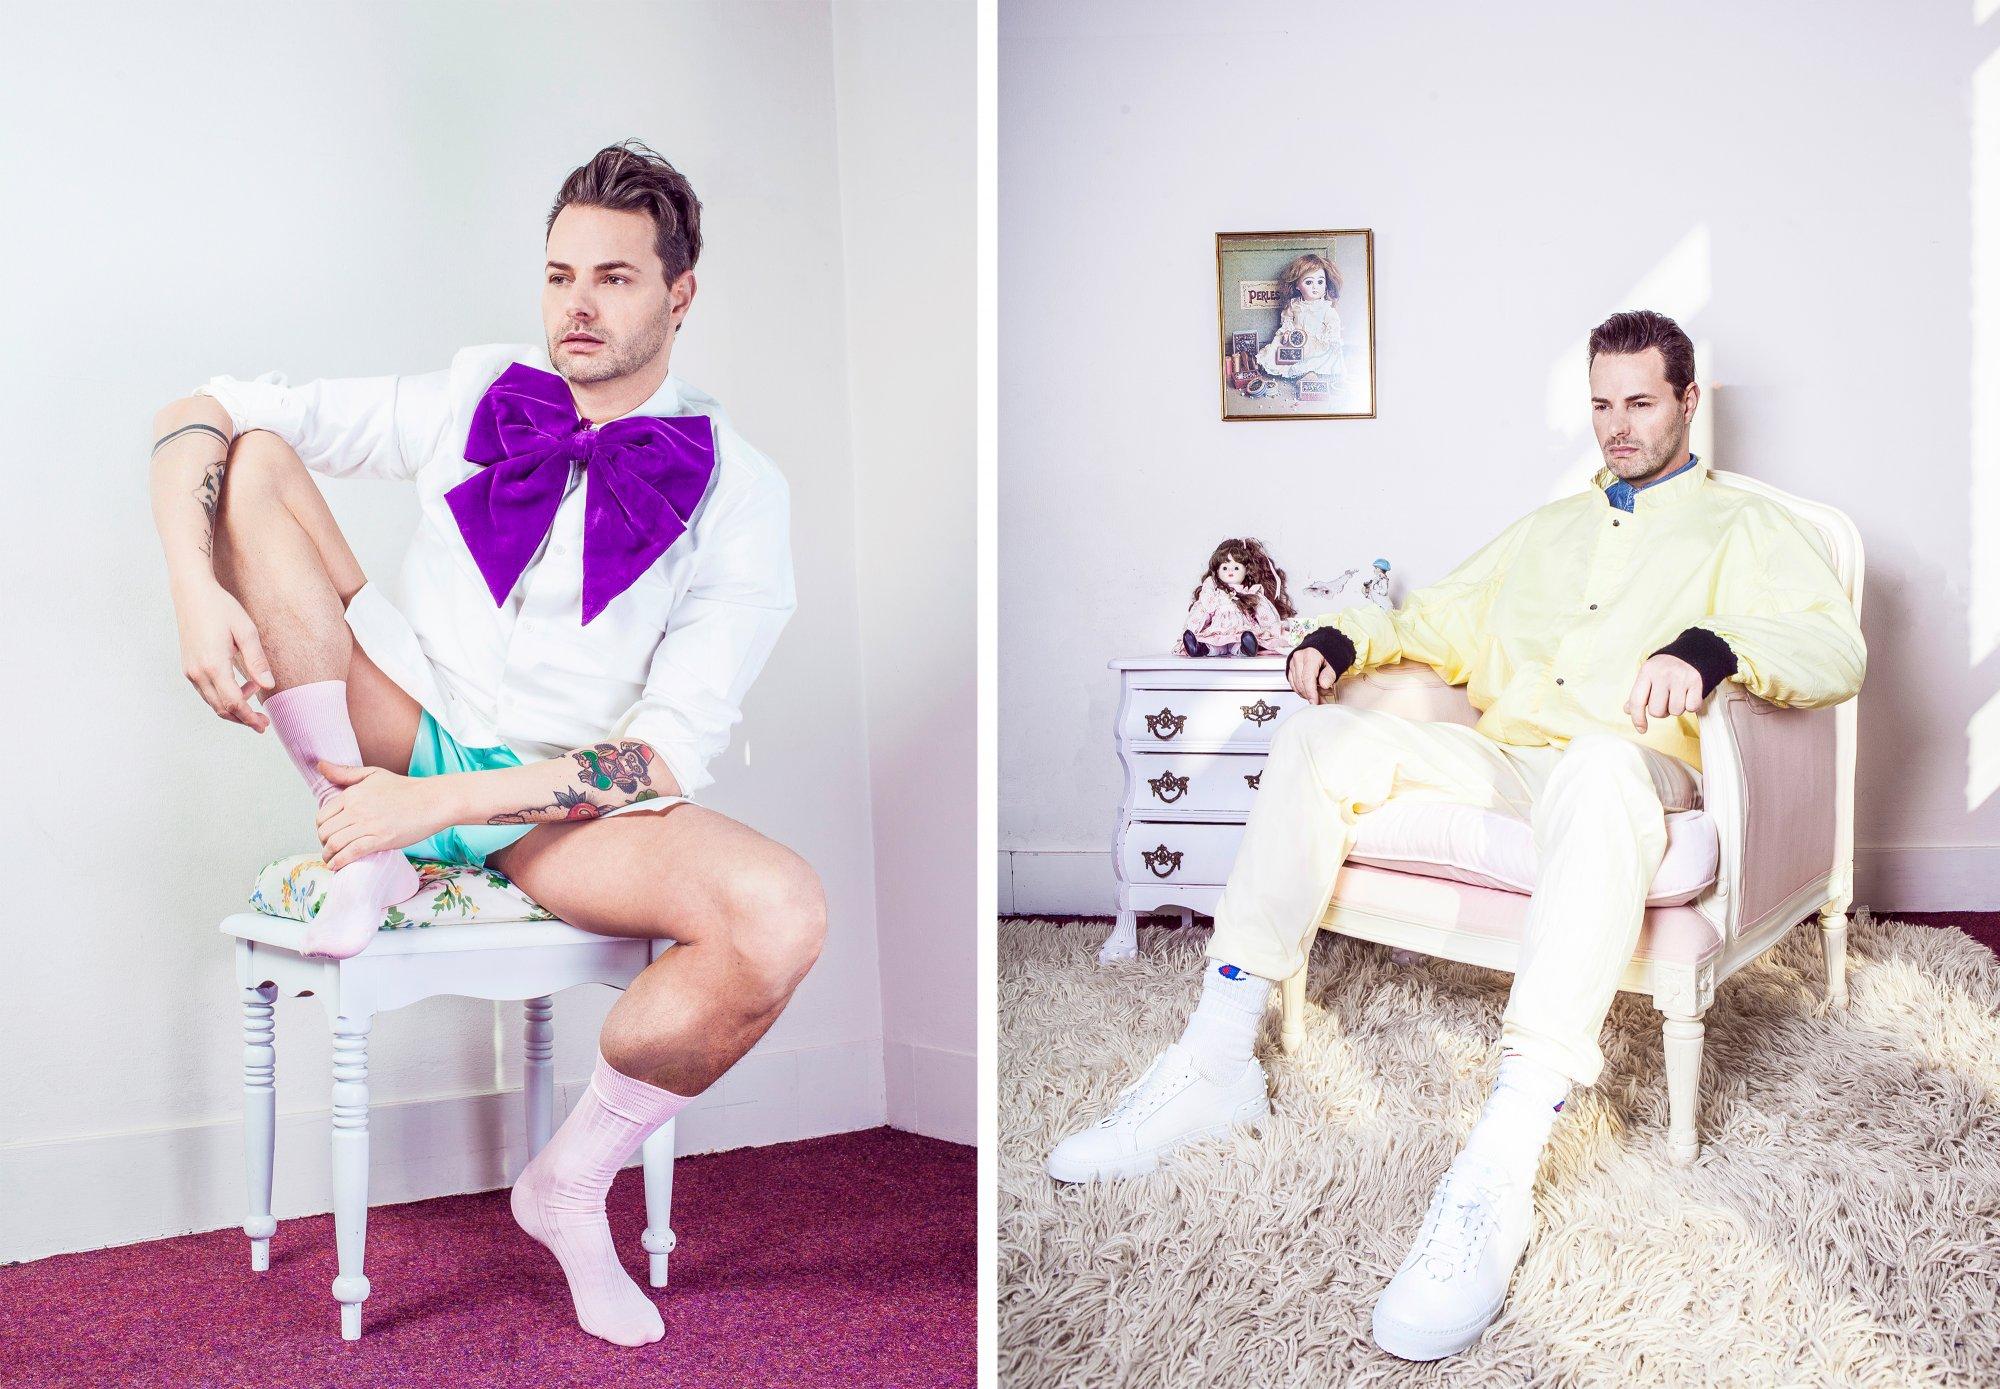 mannen met grote lul Fotos Gay Asian Tumblr porno